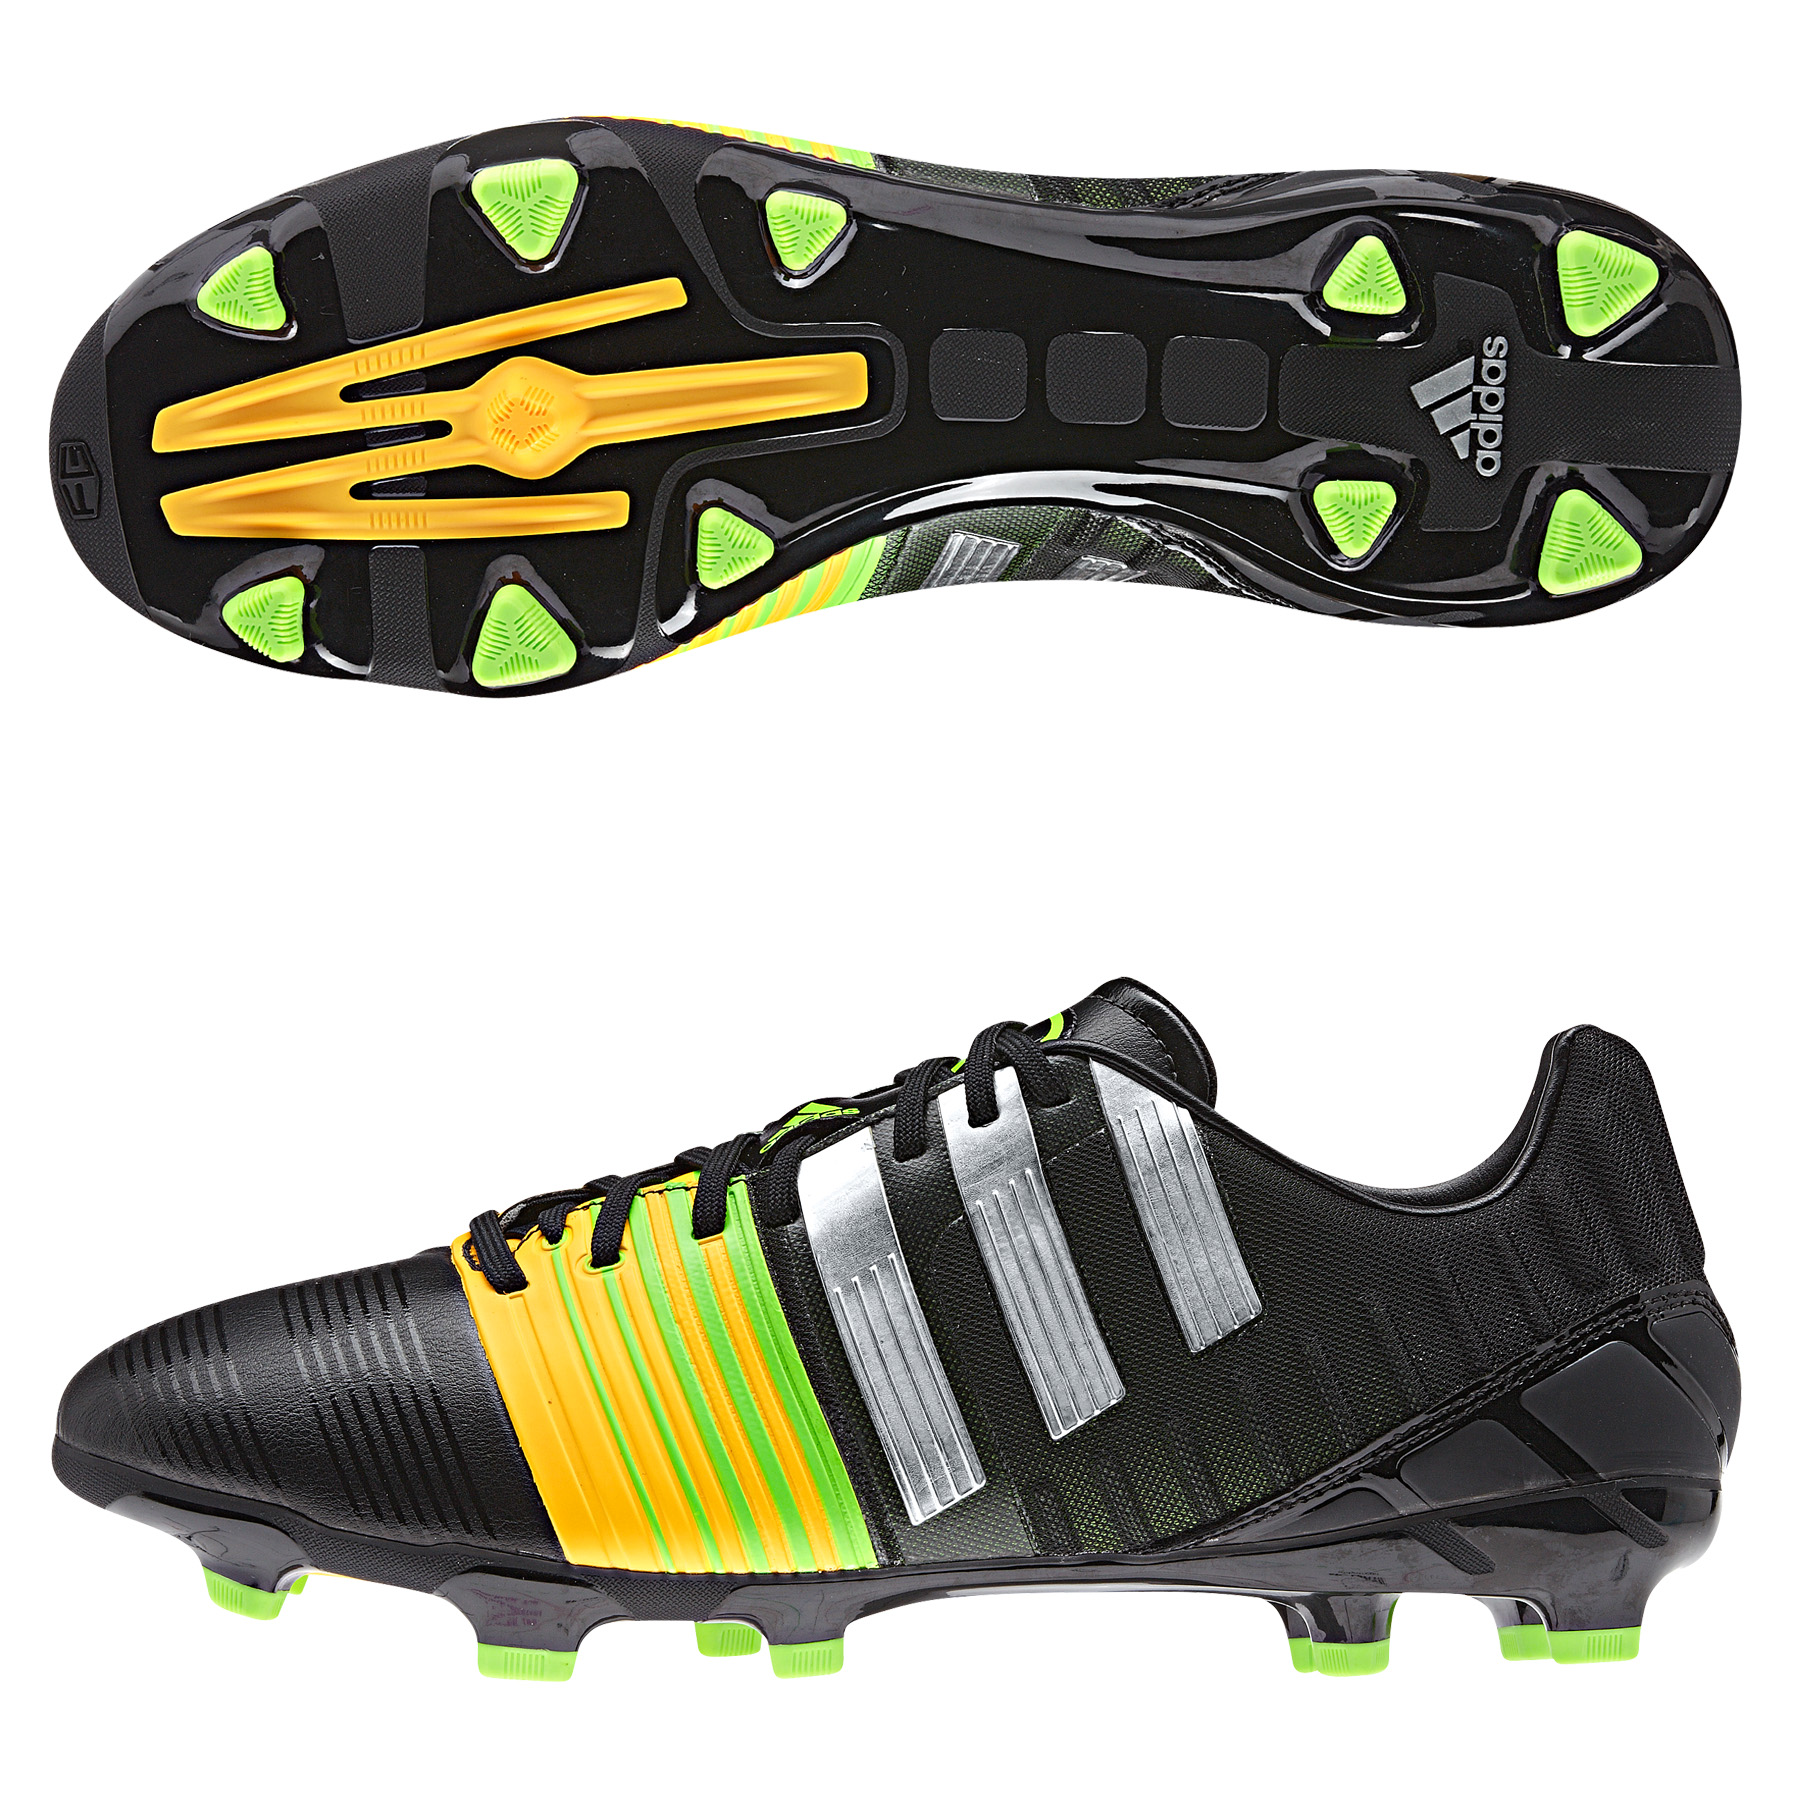 Adidas Nitrocharge 2.0 Firm Ground Black